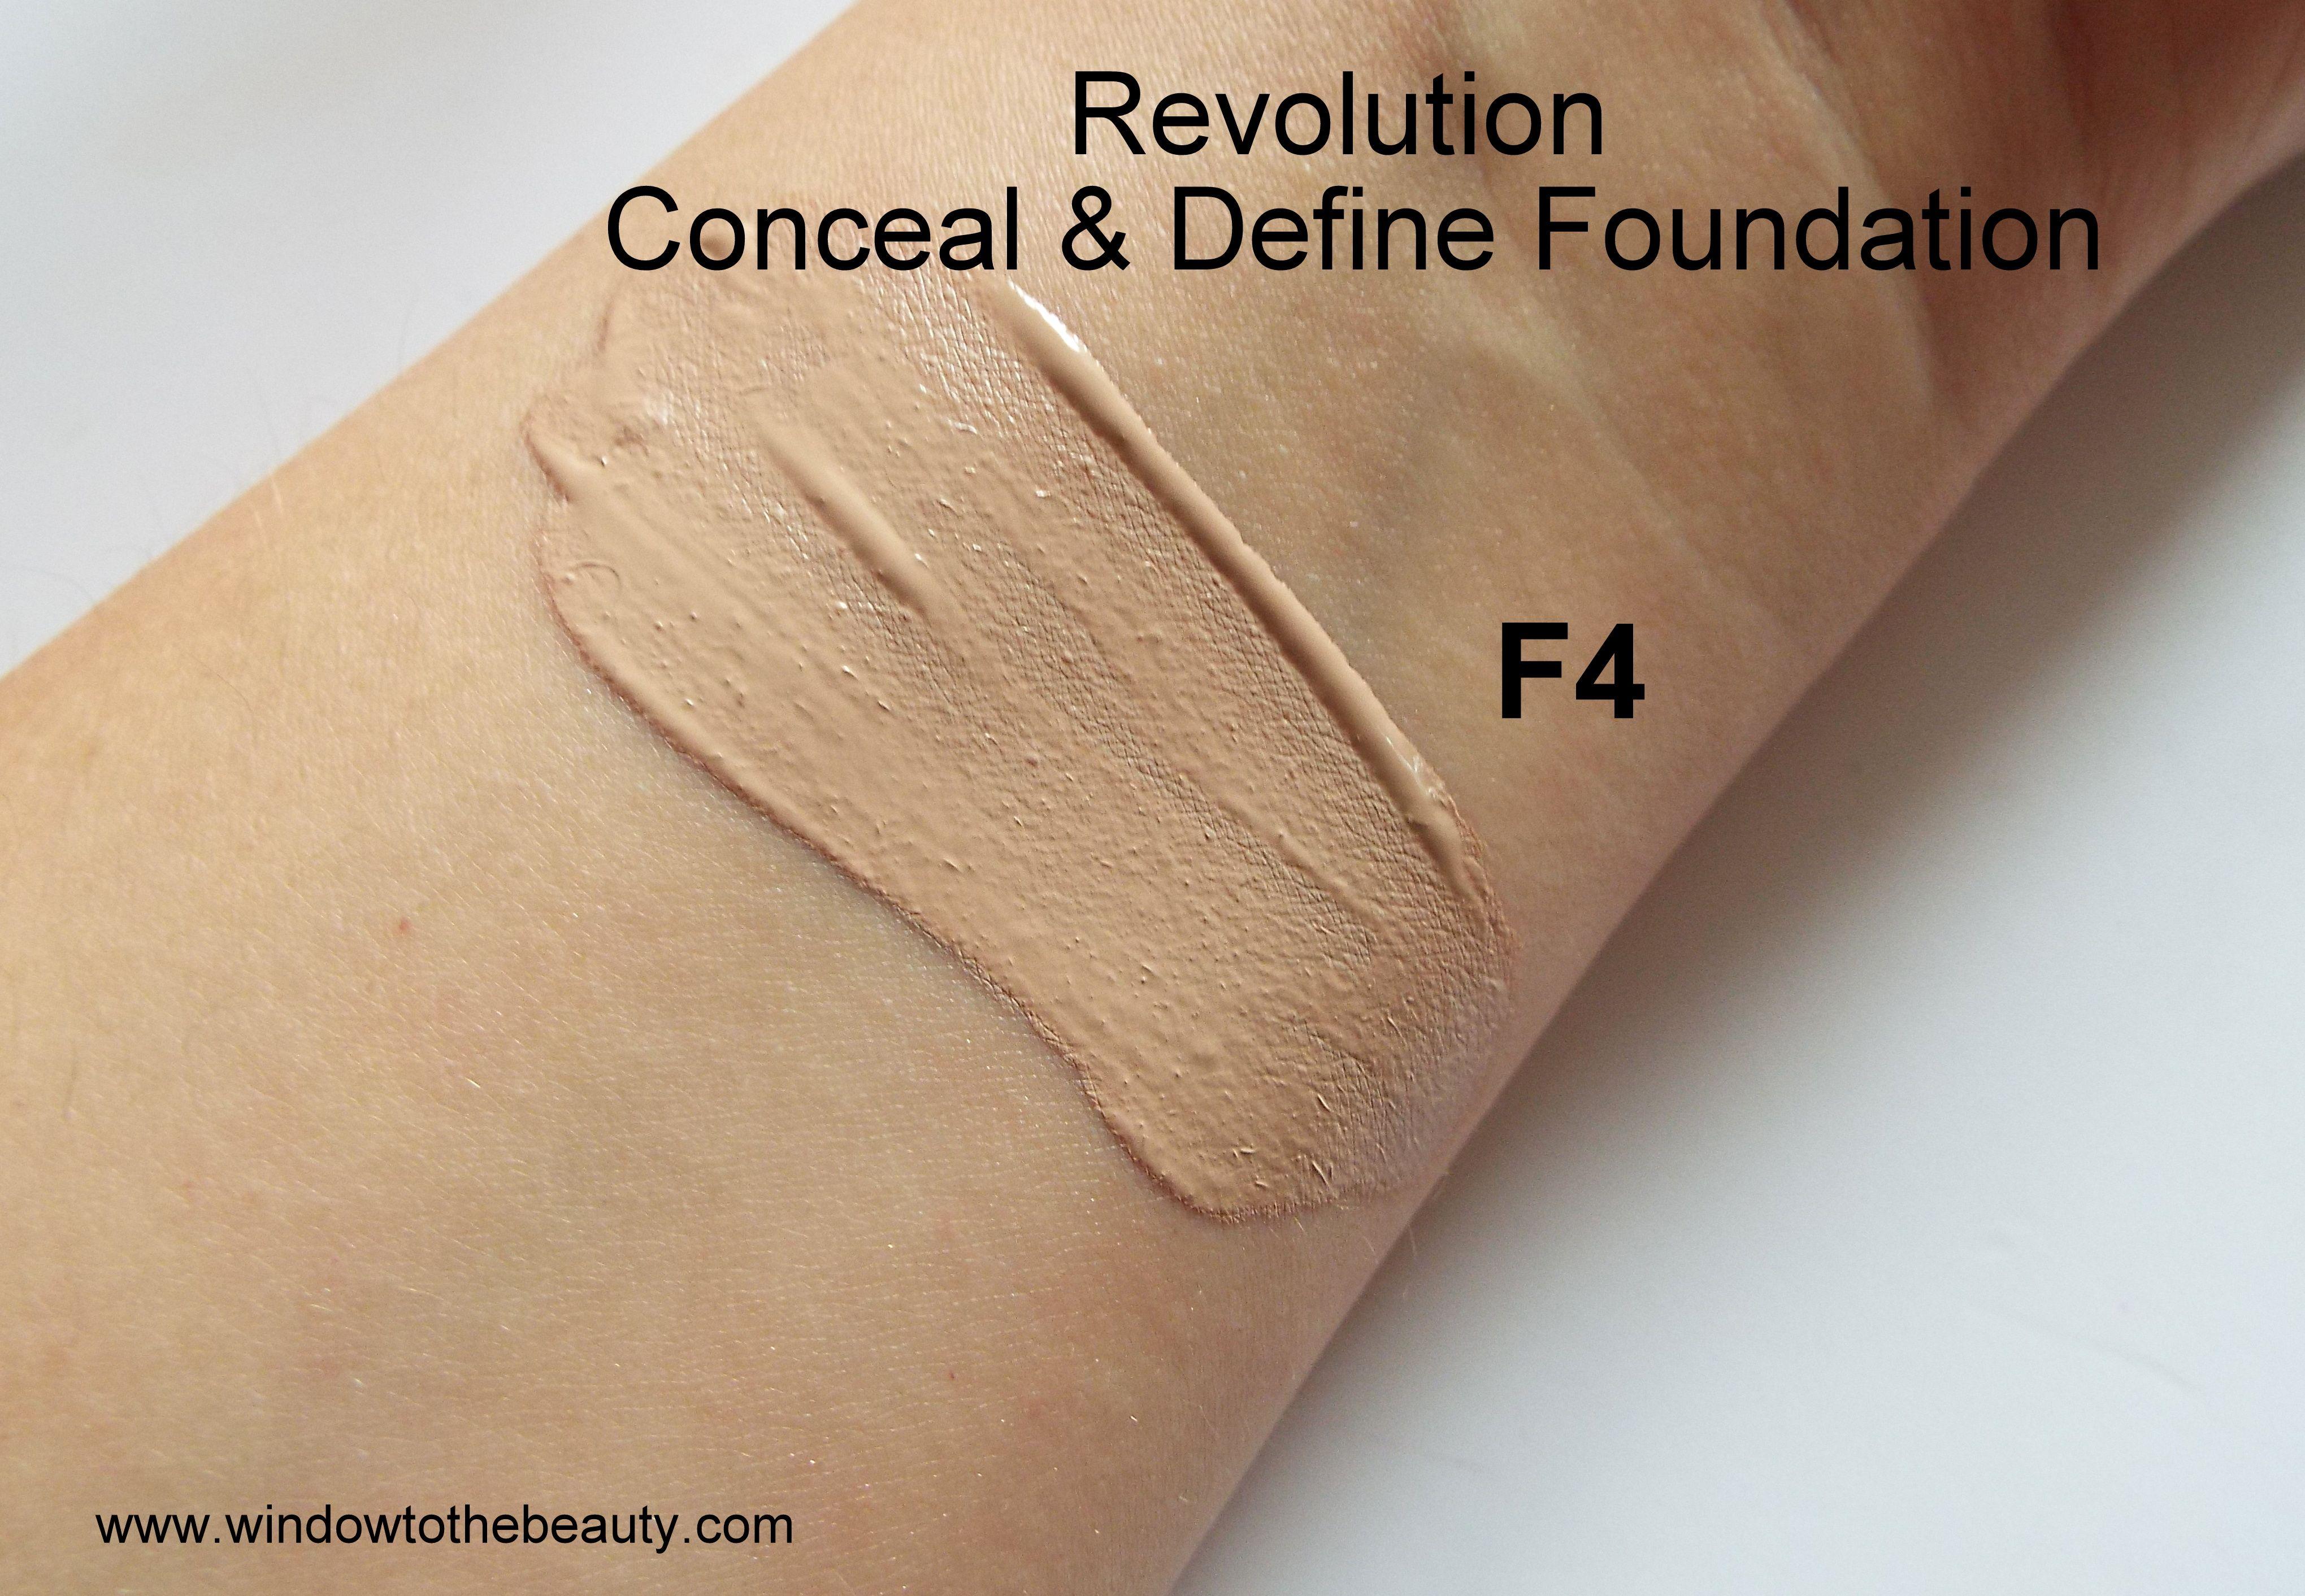 Revolution Conceal & Define Foundation f4 swatches